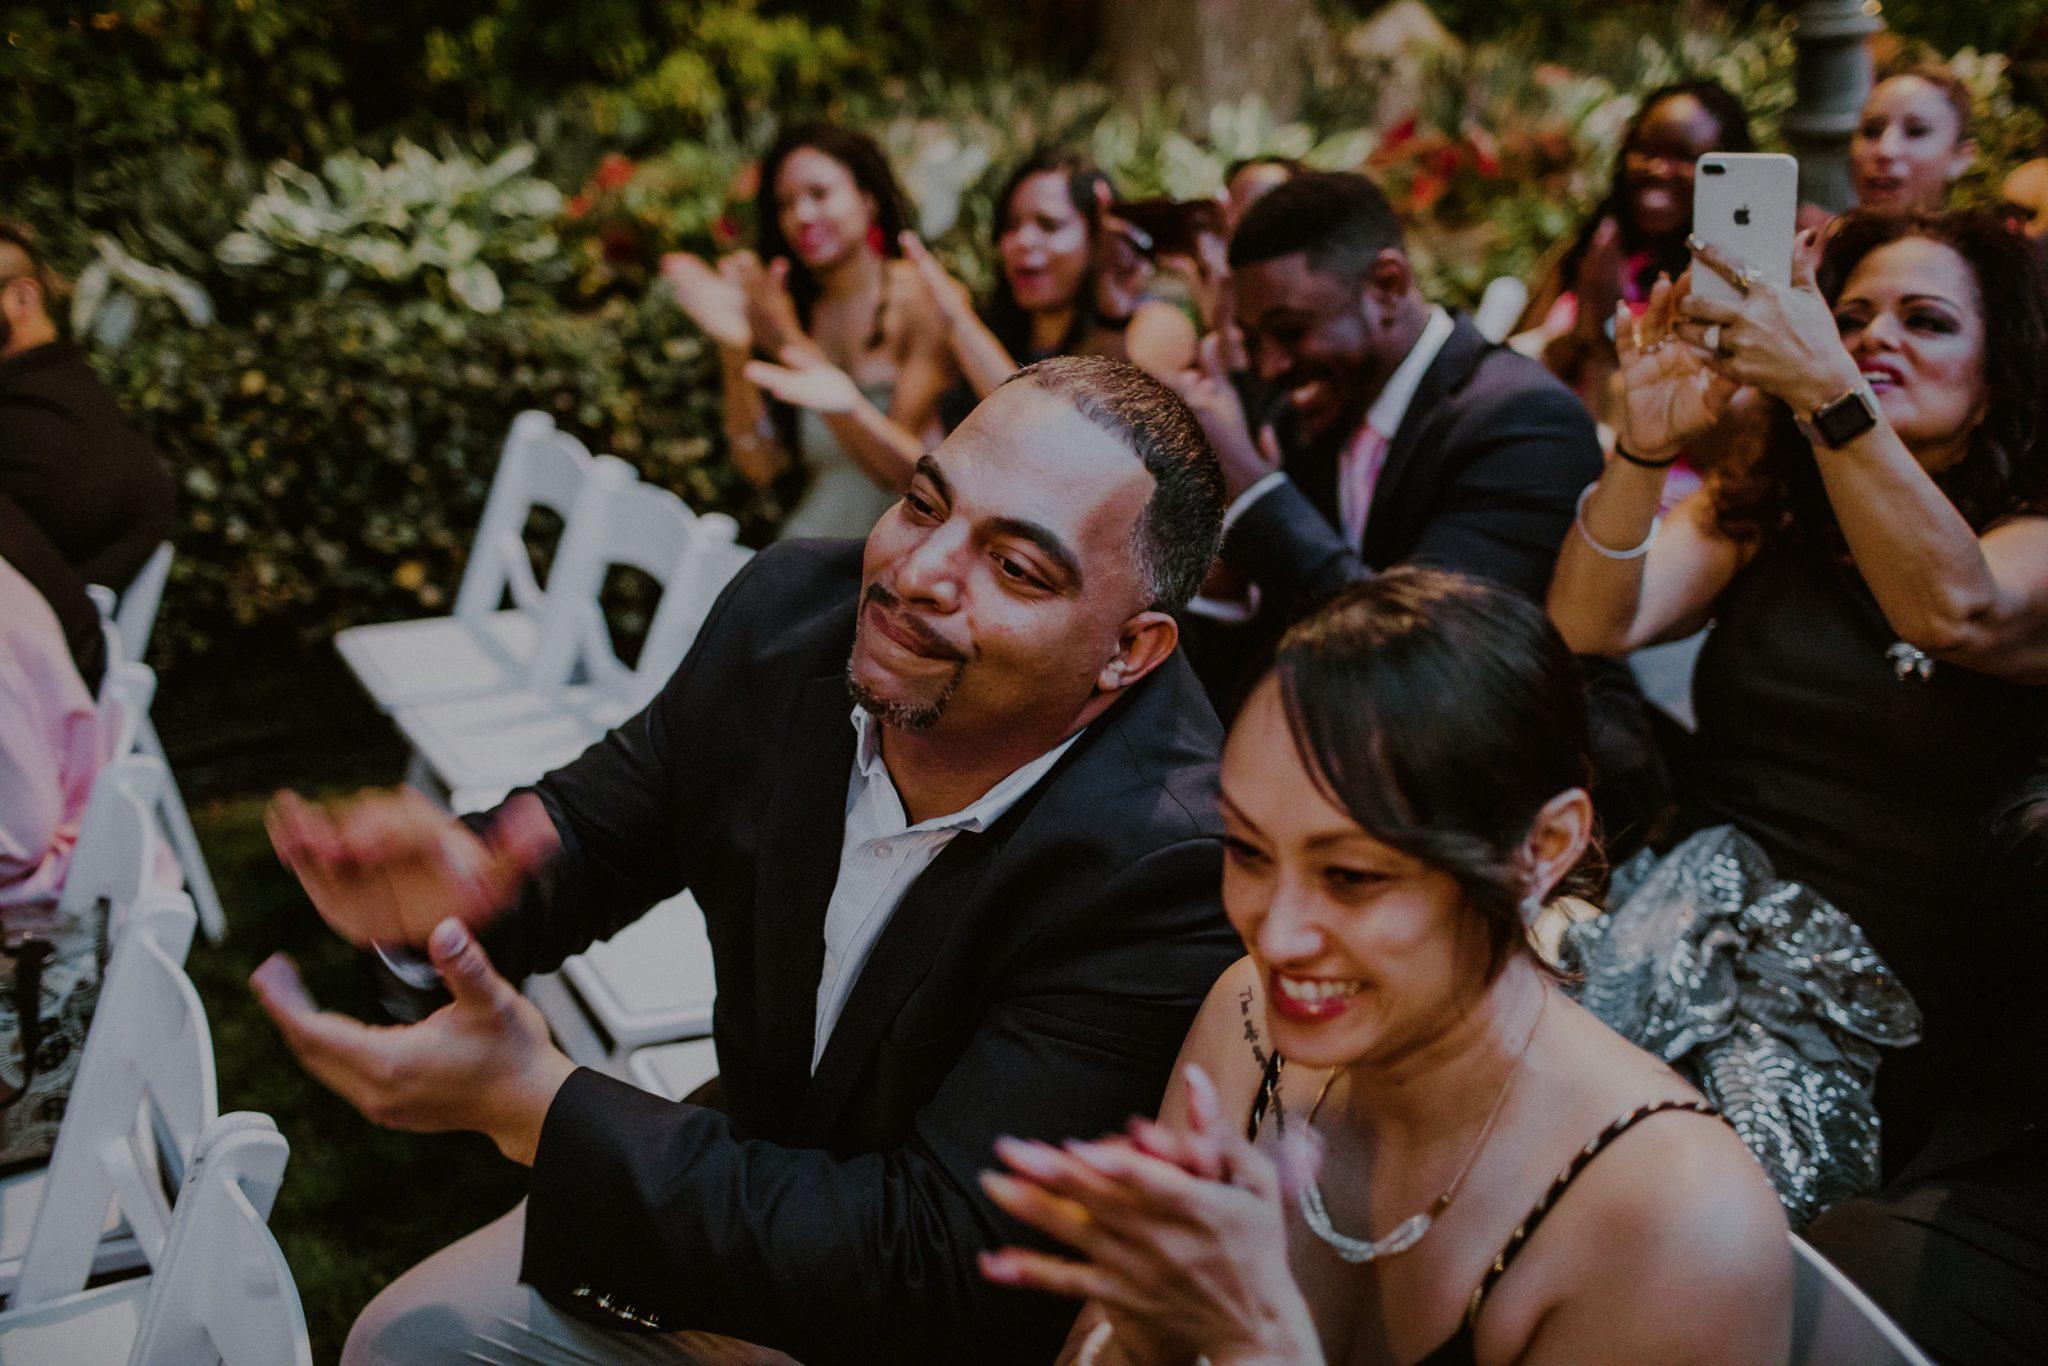 candid photography of wedding ceremony in woodbury ny